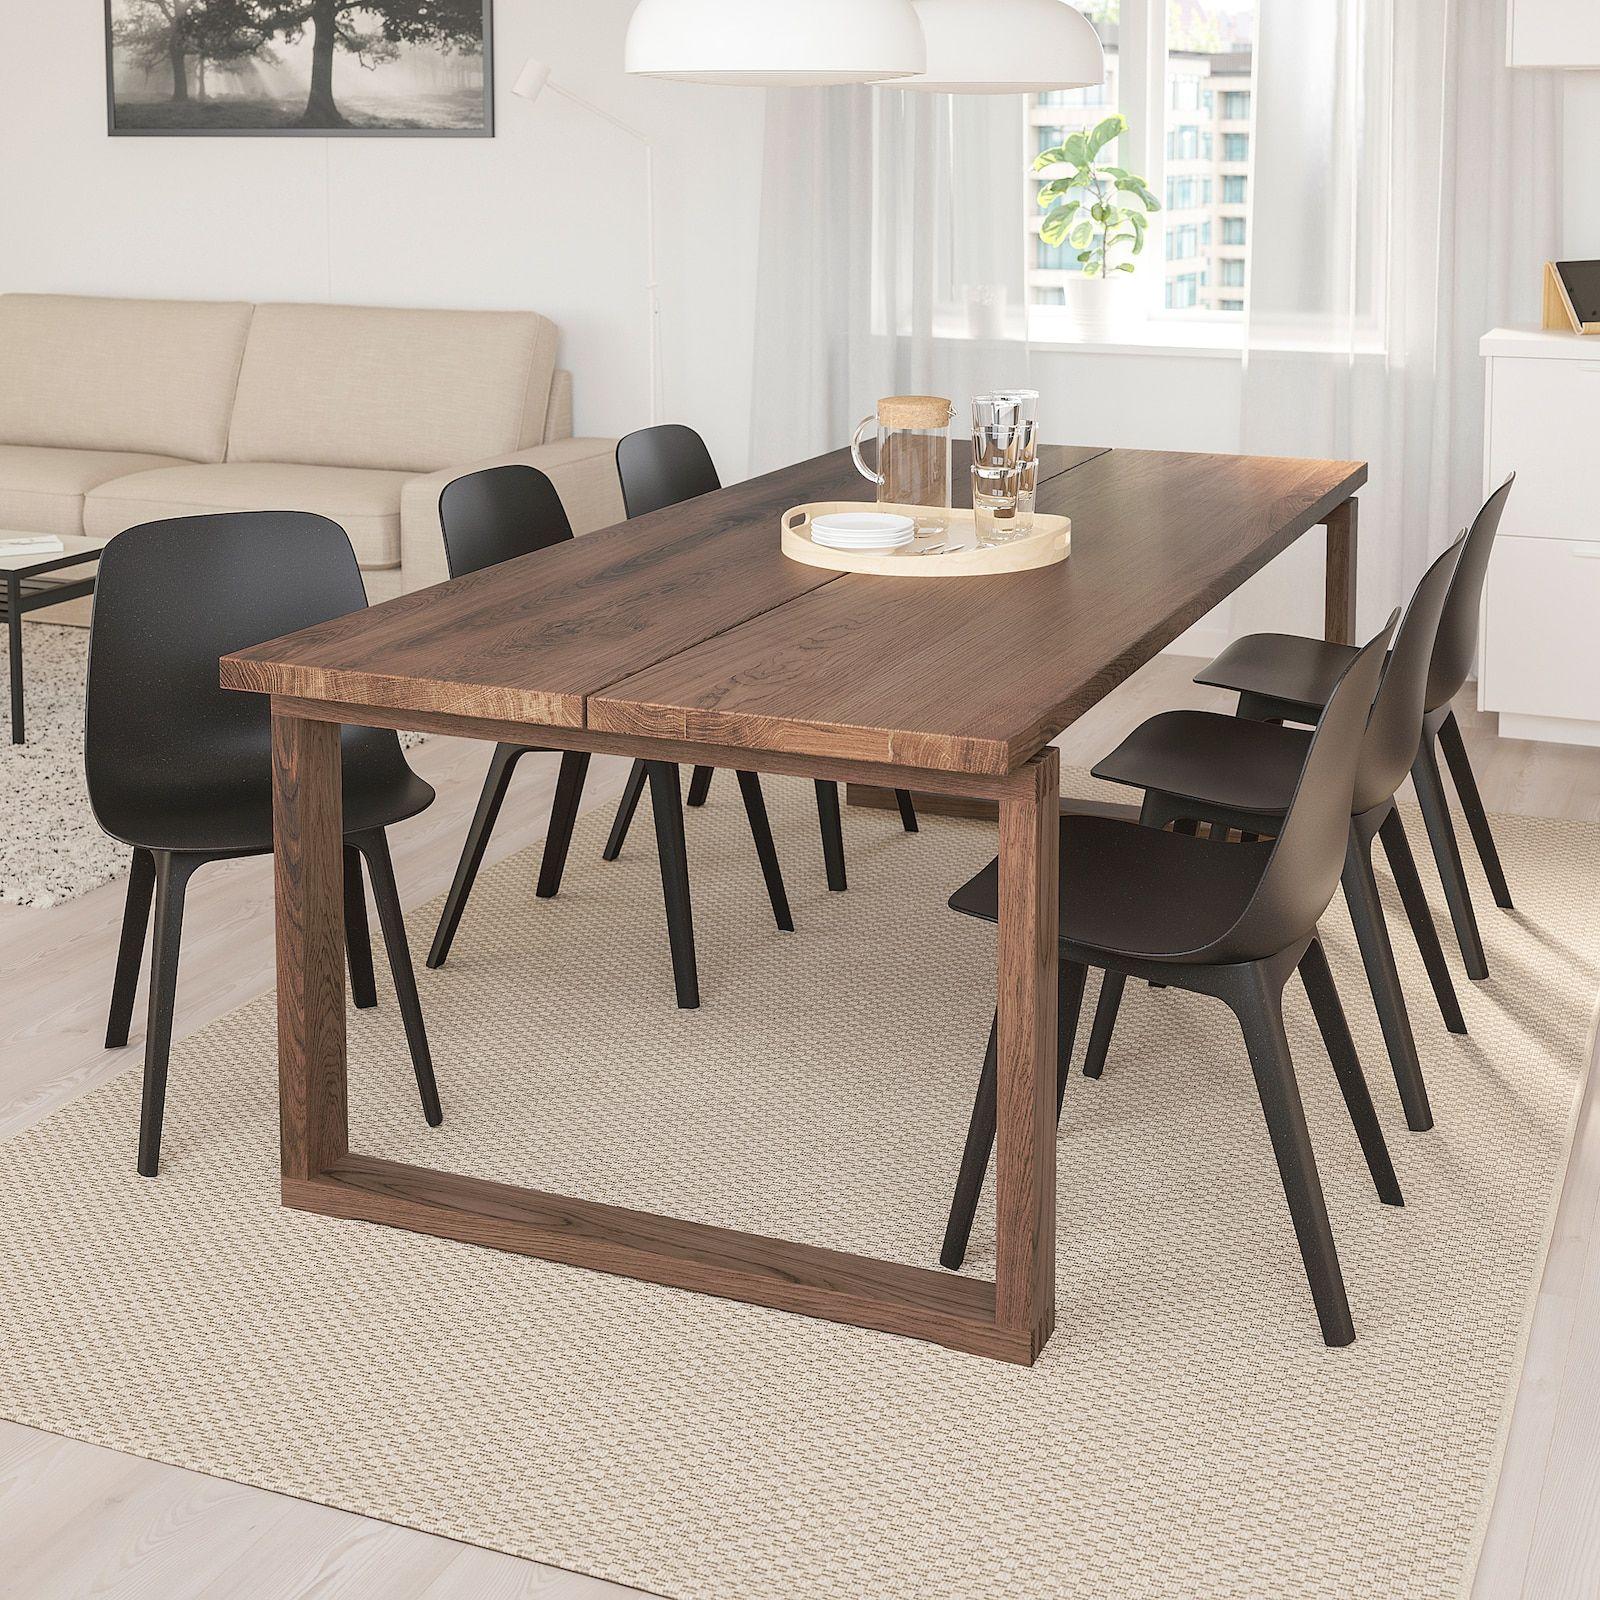 "MÖRBYLÅNGA / ODGER Table and 6 chairs, oak veneer/anthracite, 865/8x393/8"" - IKEA"